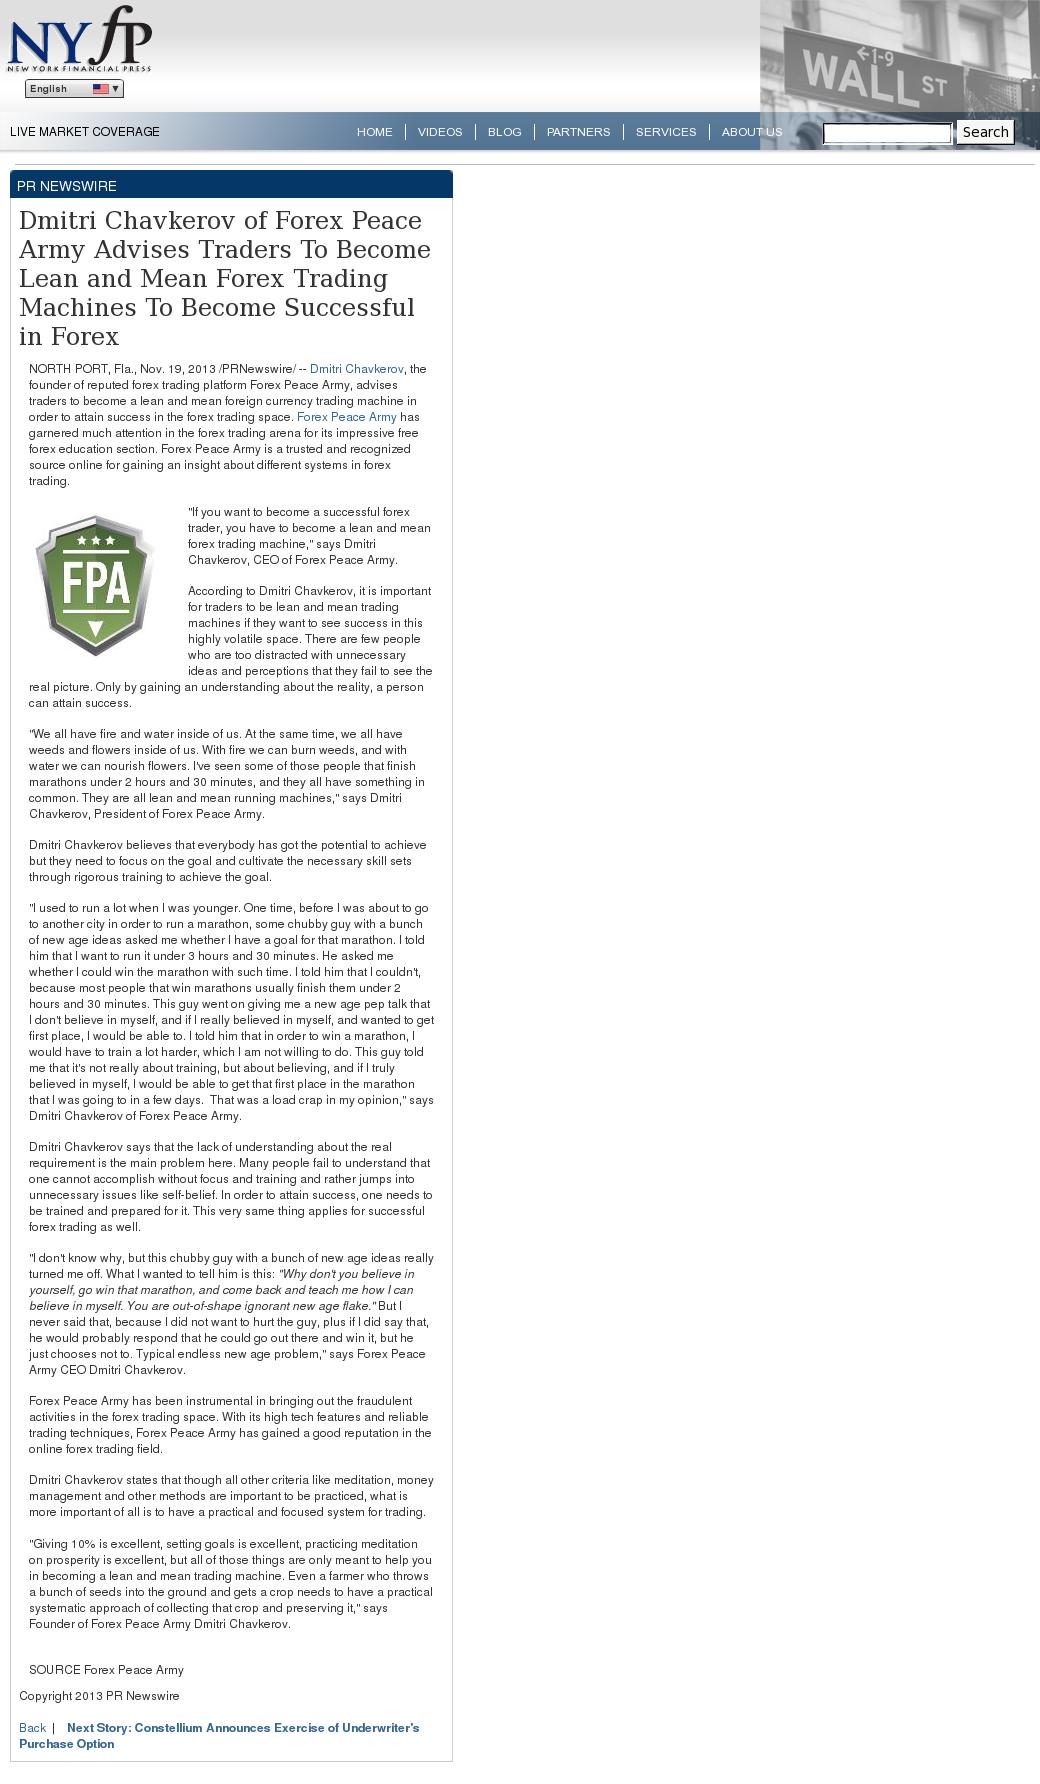 Dmitri Chavkerov - New York Financial Press [NYFP] - Lean Forex Trading